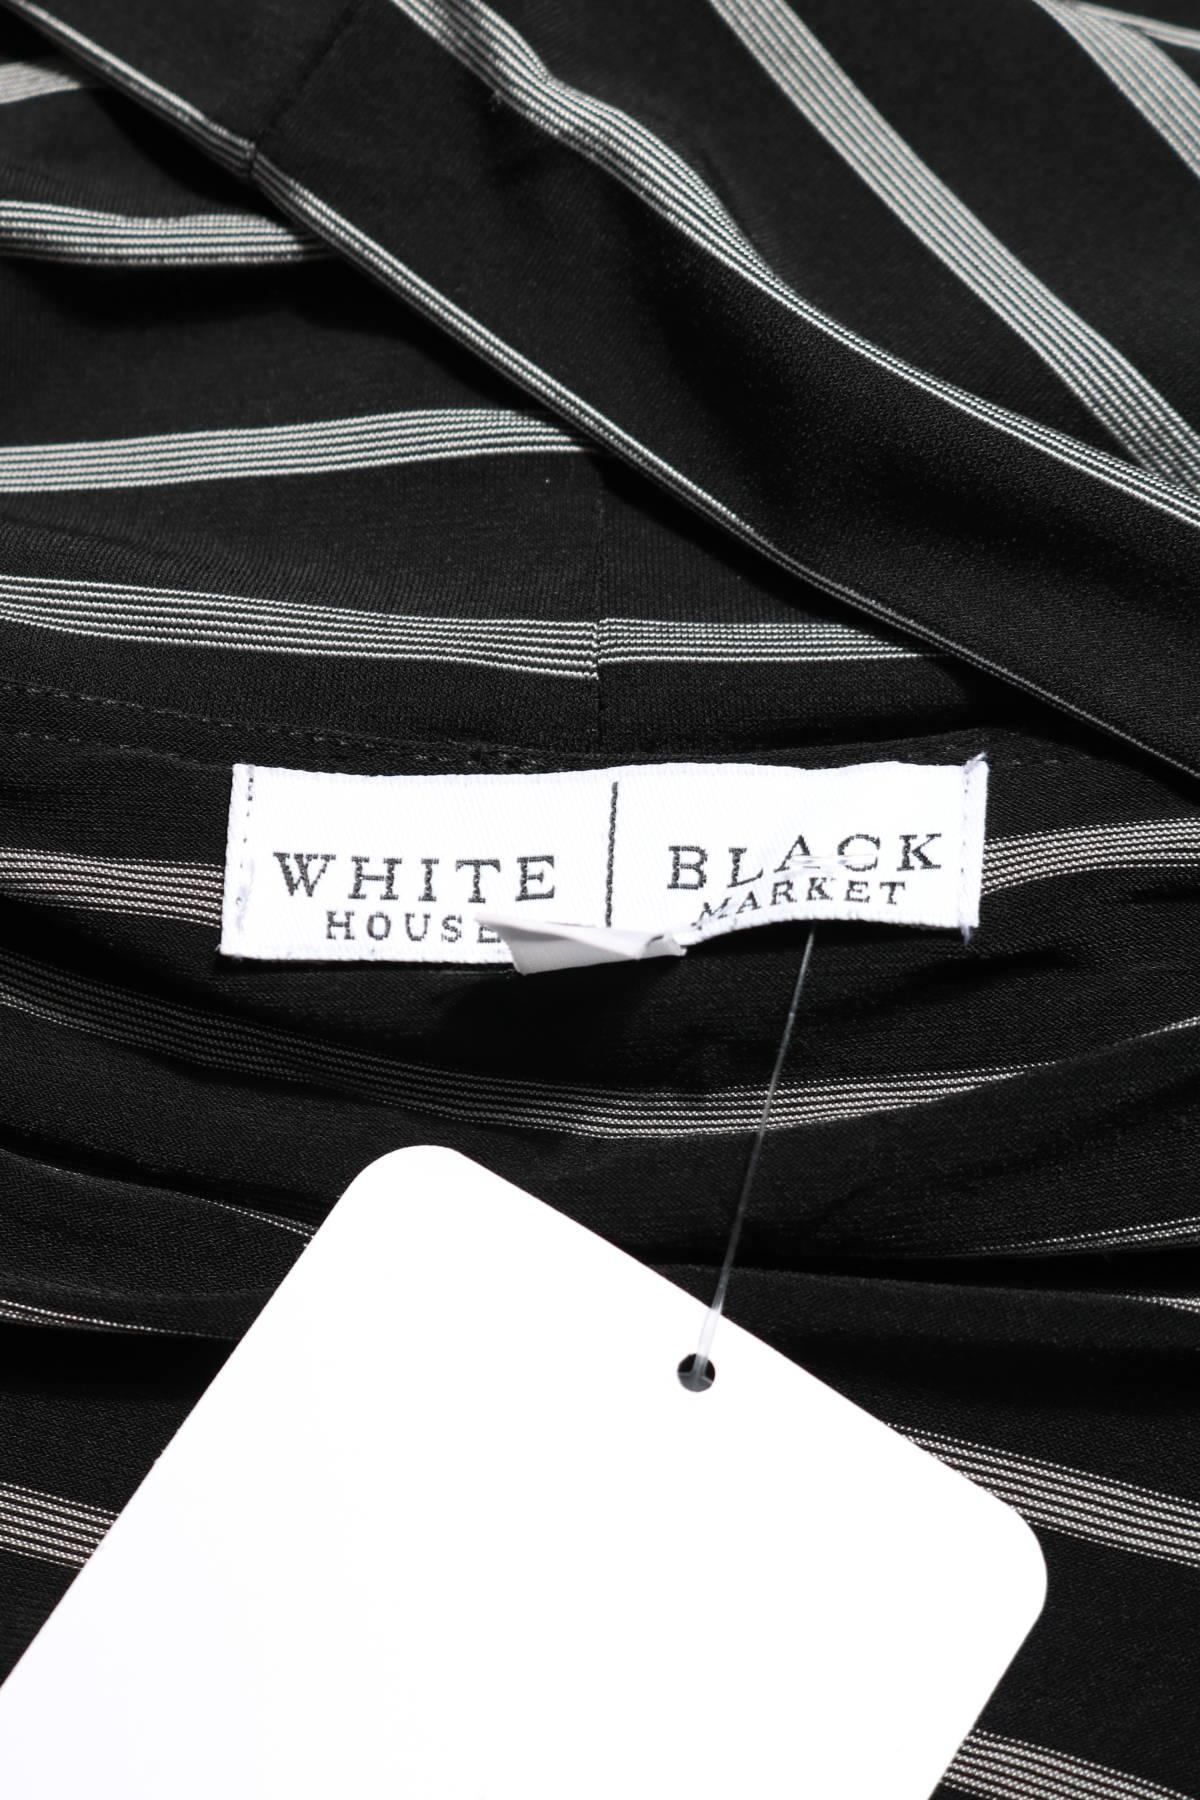 Блуза White House / Black Market3